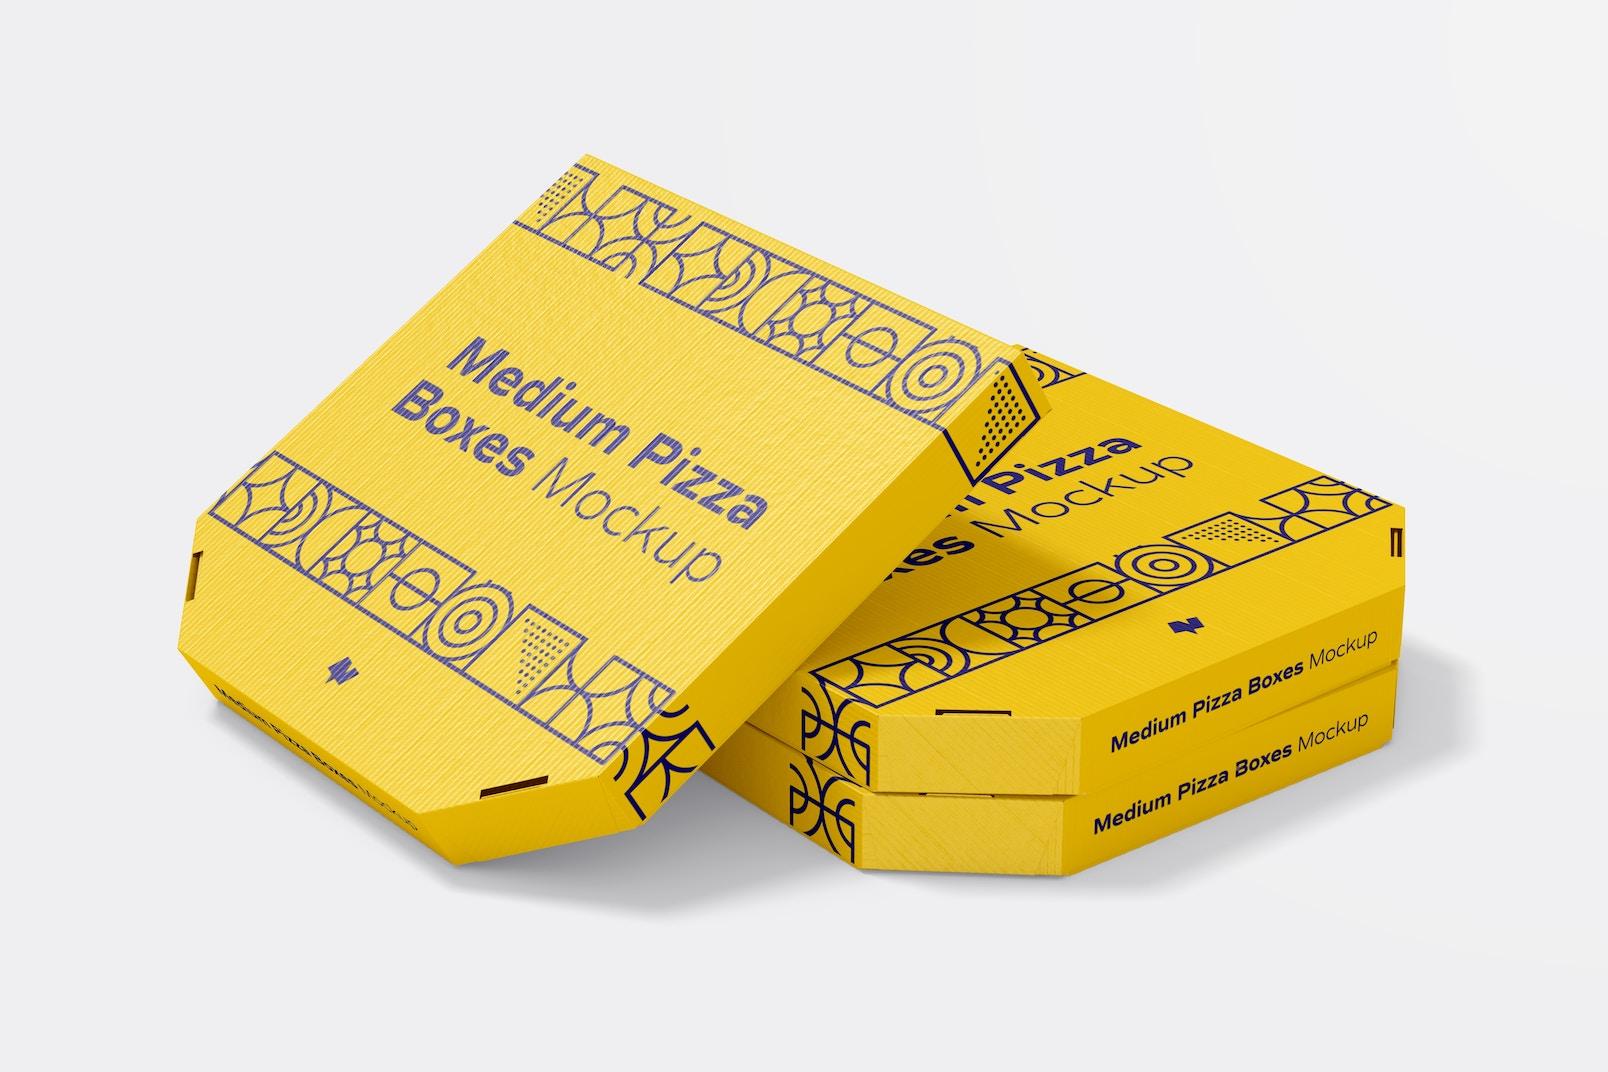 Medium Pizza Box Mockup